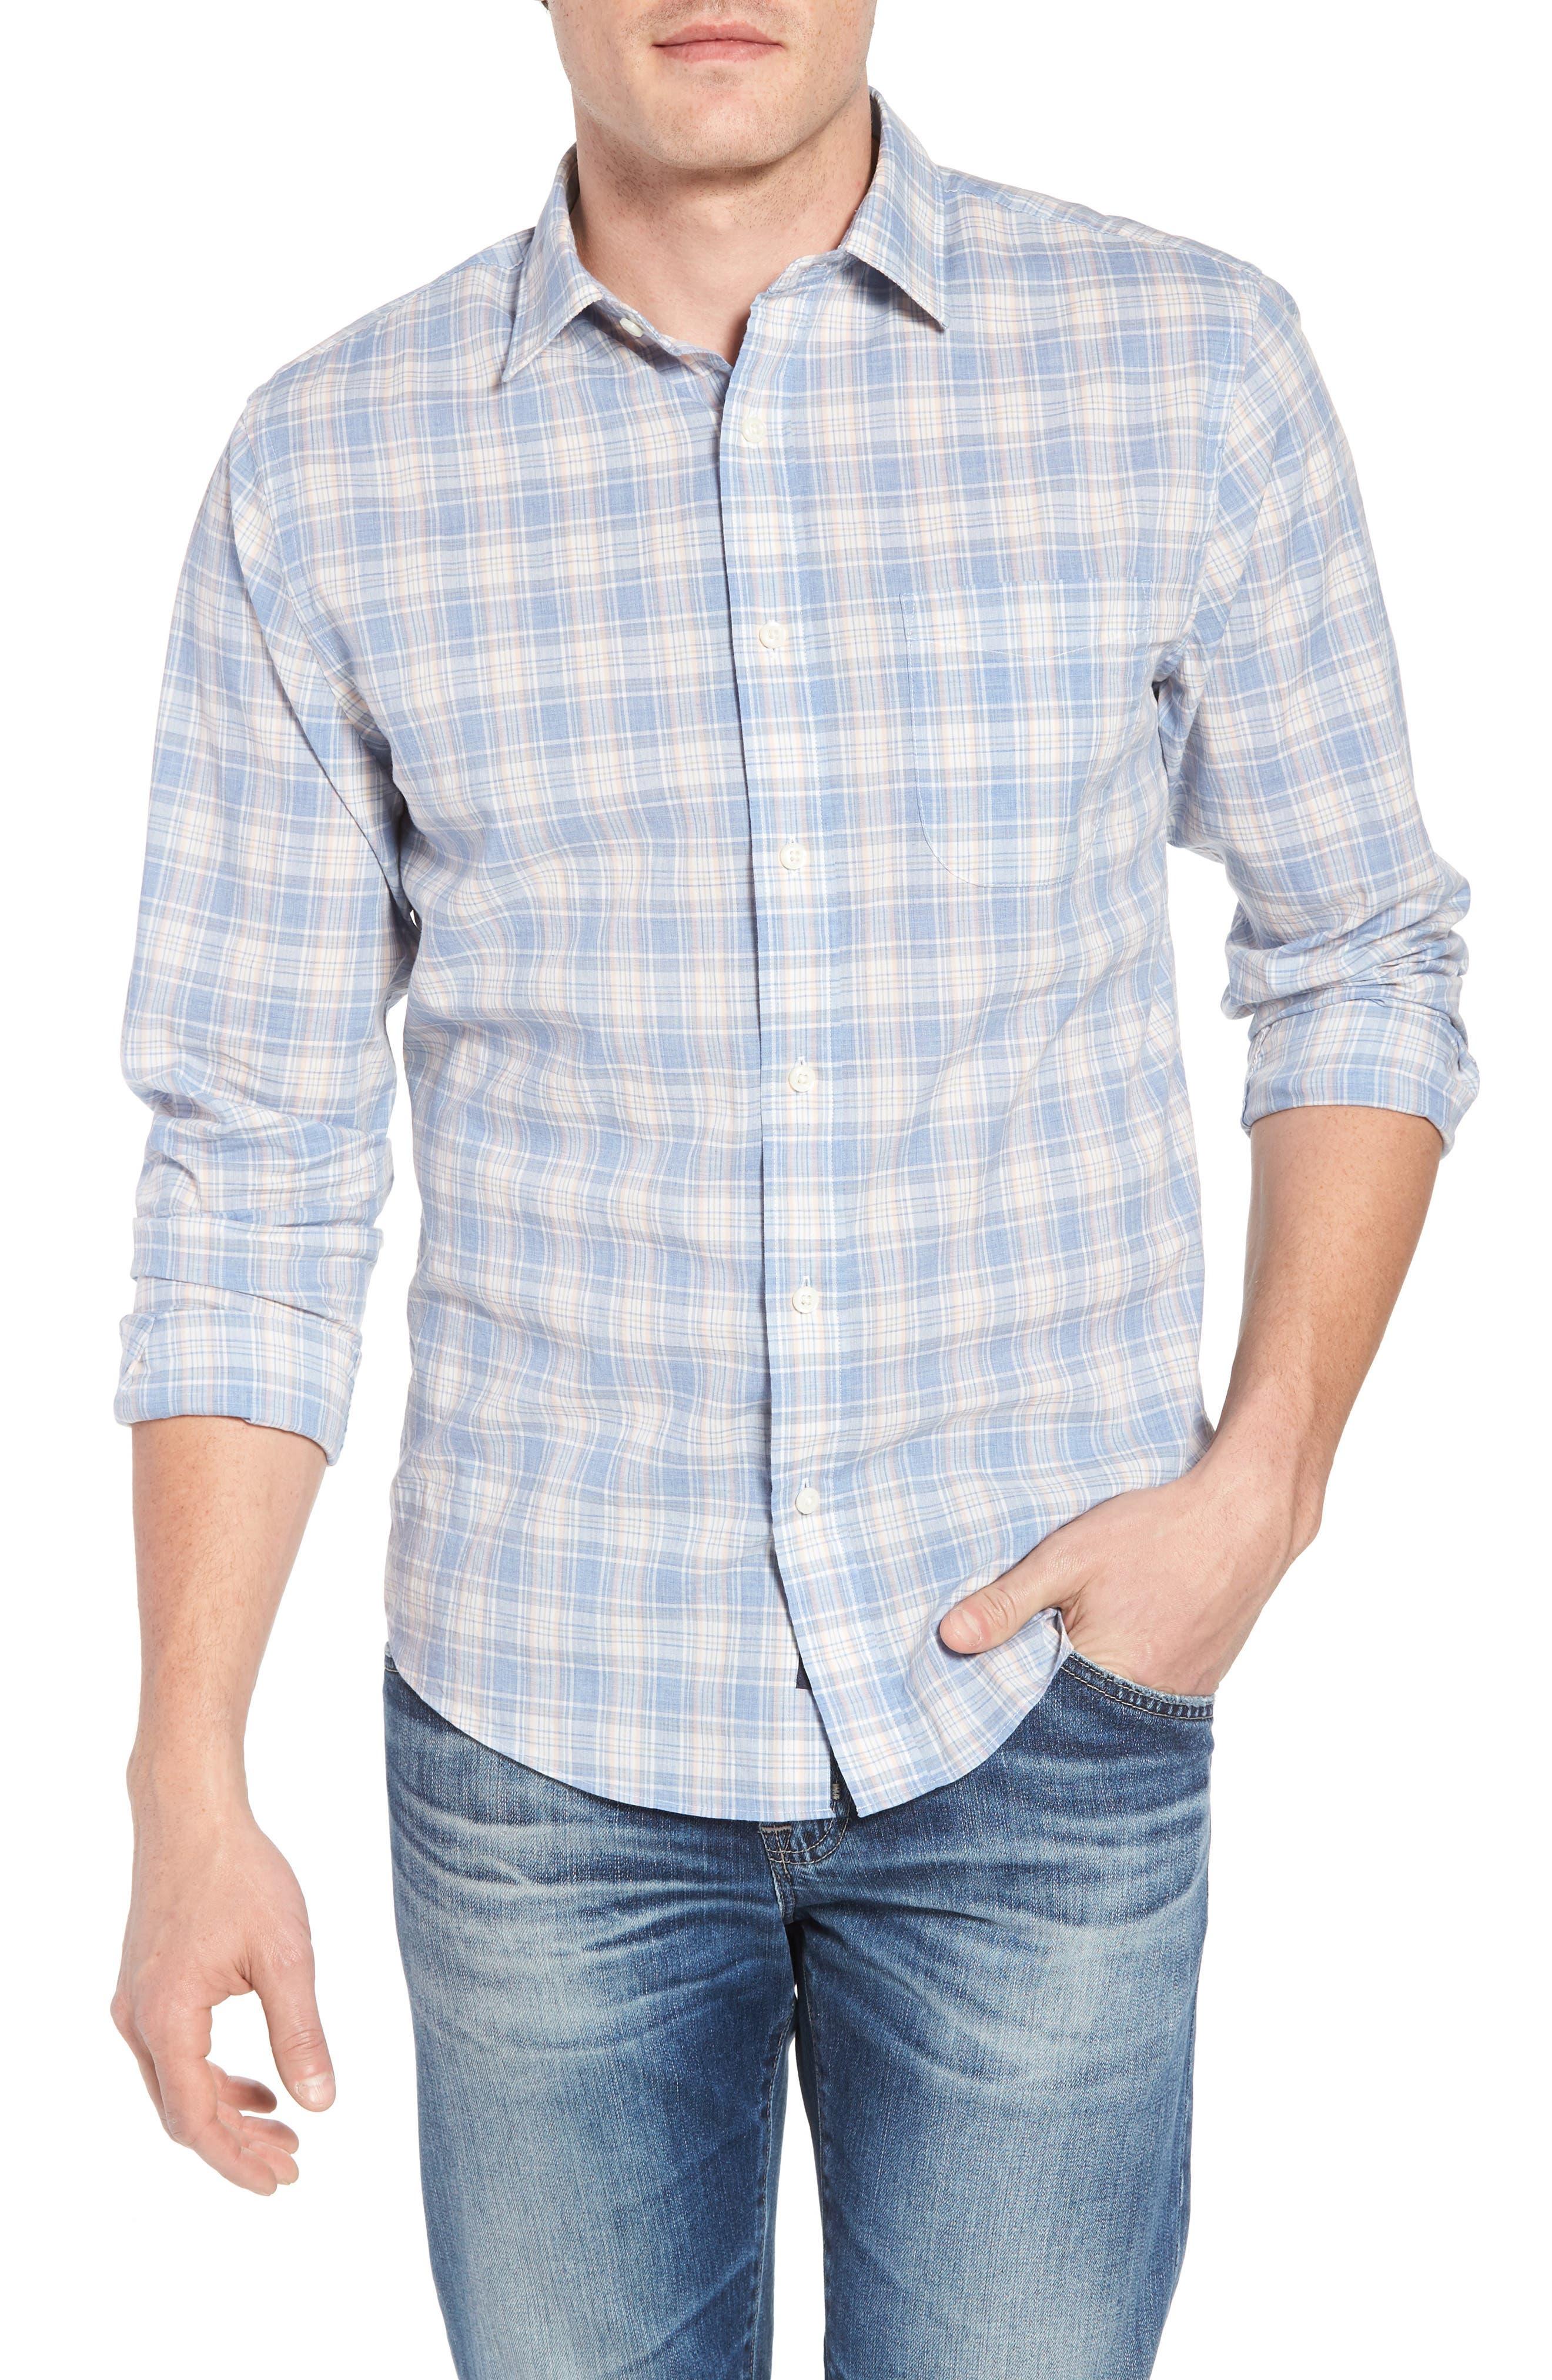 Ventura Plaid Sport Shirt,                         Main,                         color, Blue Coral Grey